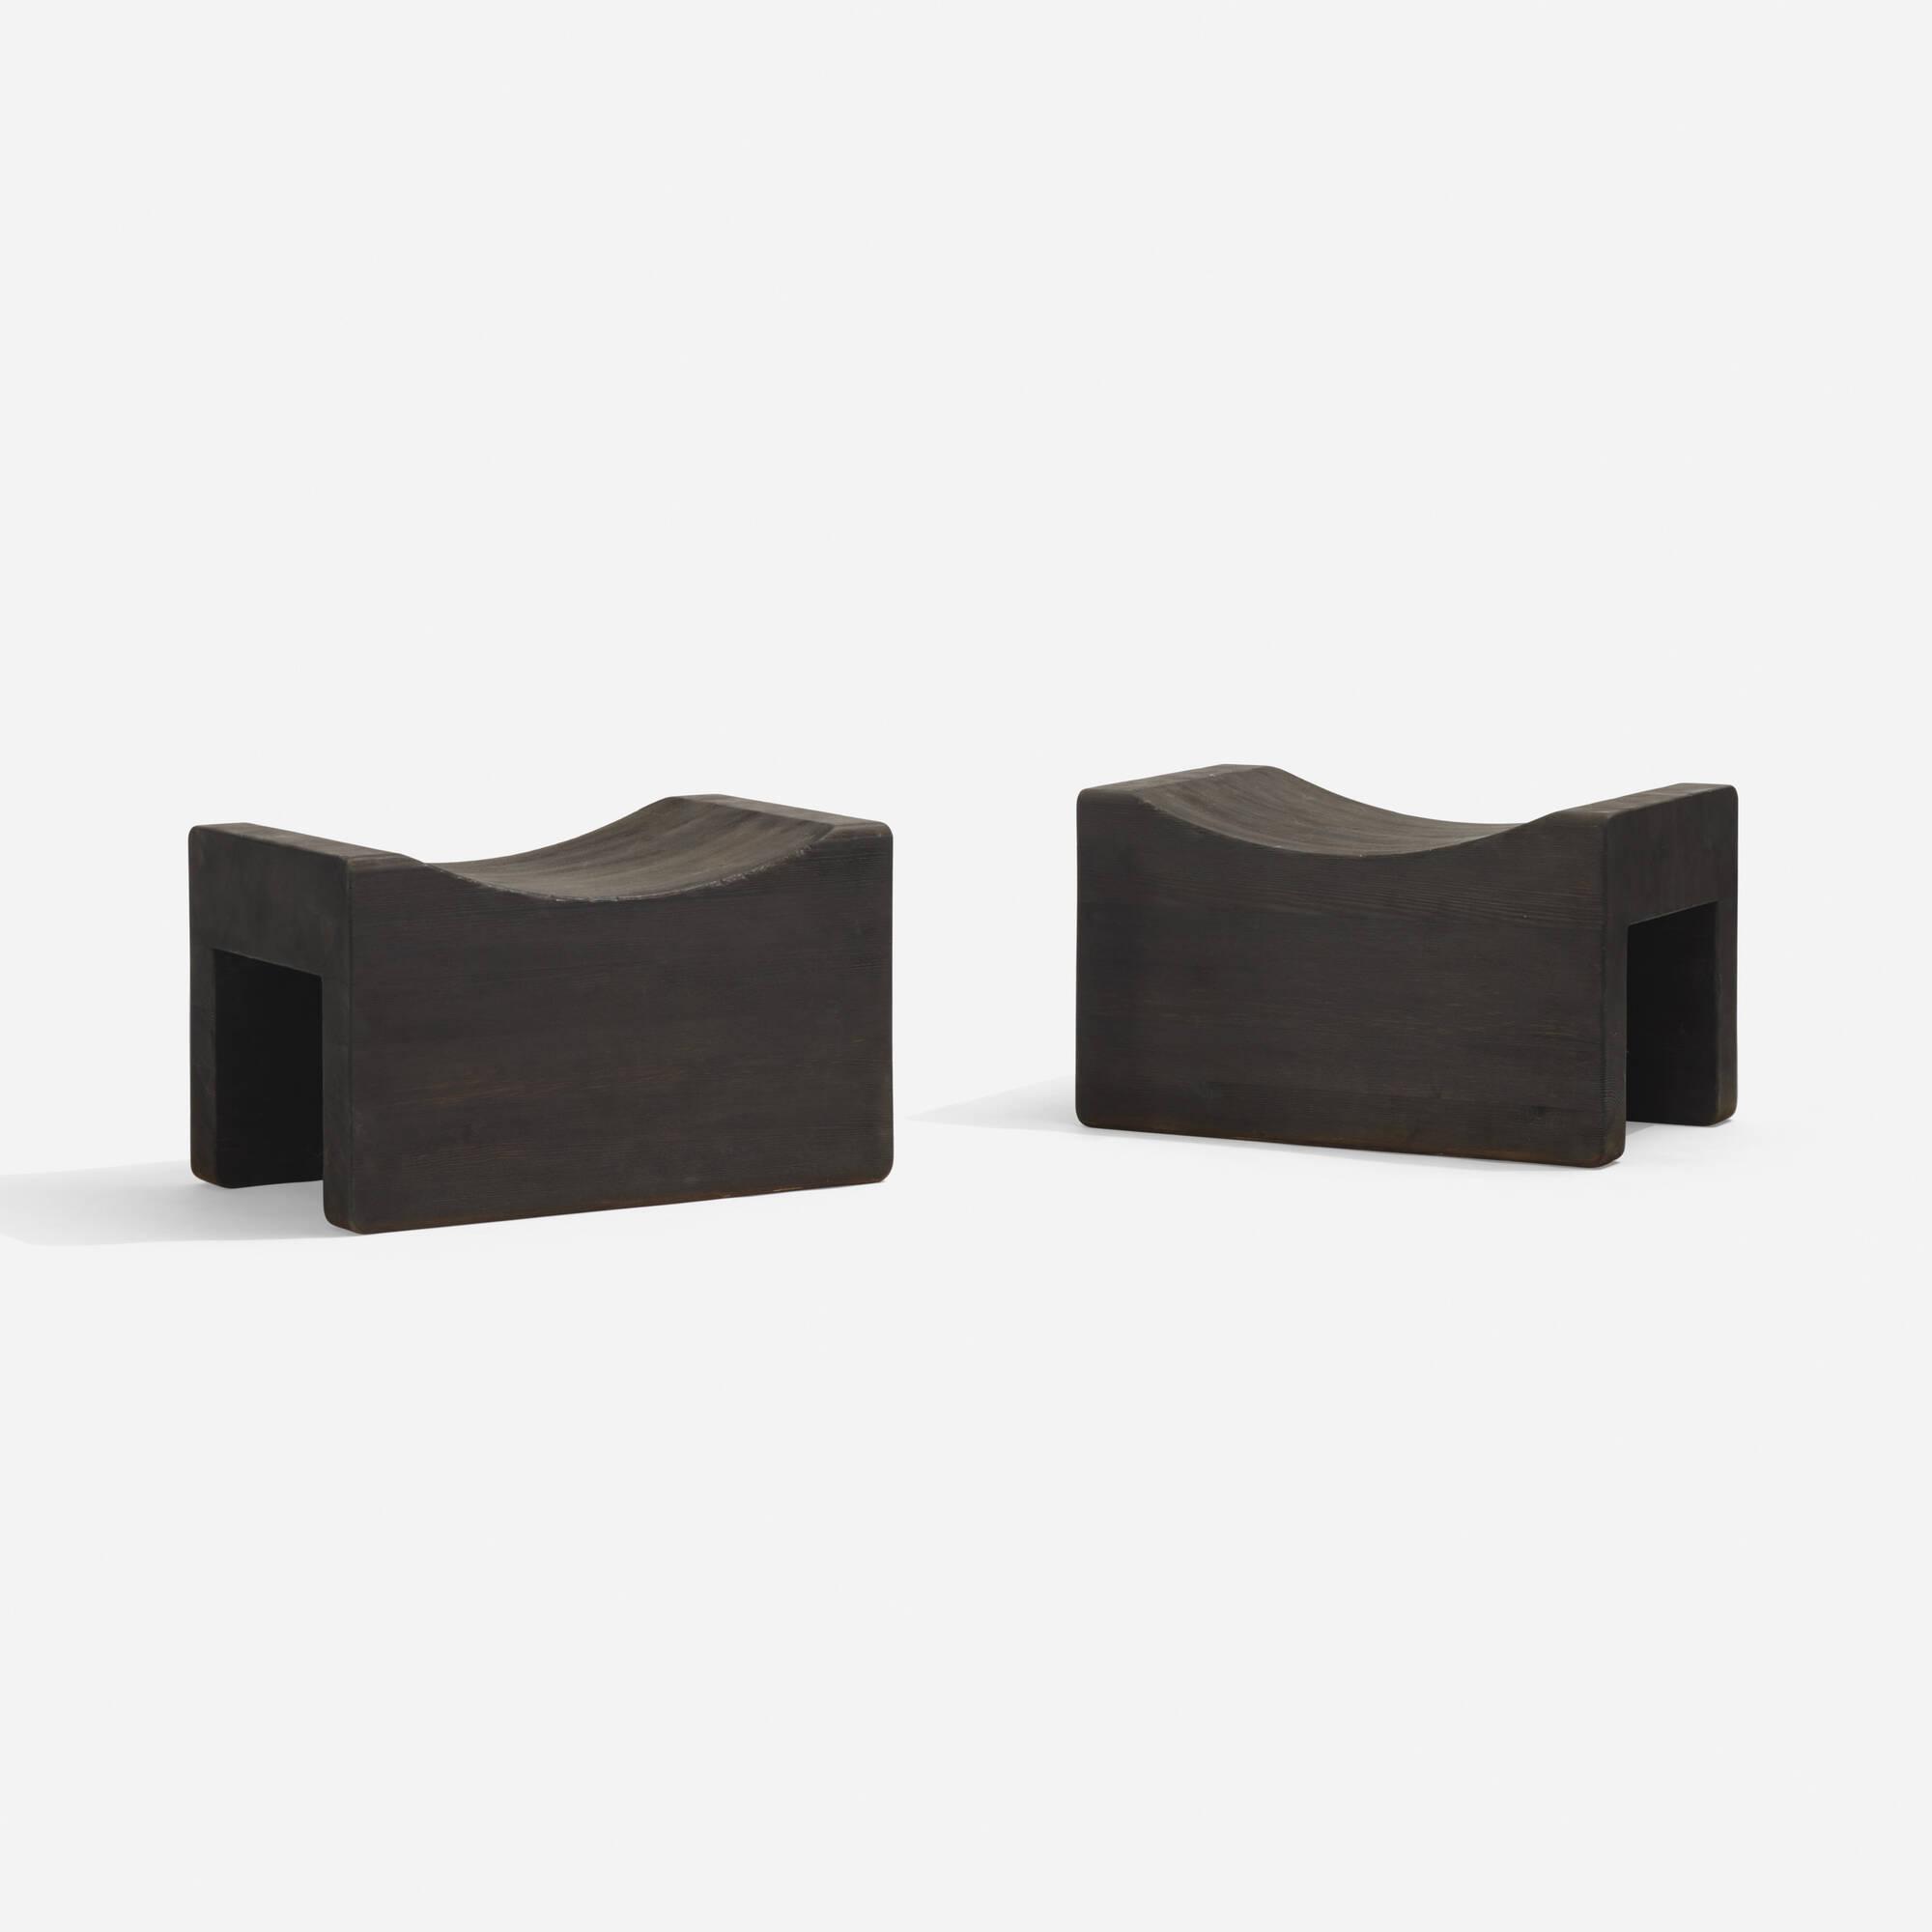 124: Axel Einar Hjorth / Utö stools, pair (1 of 3)